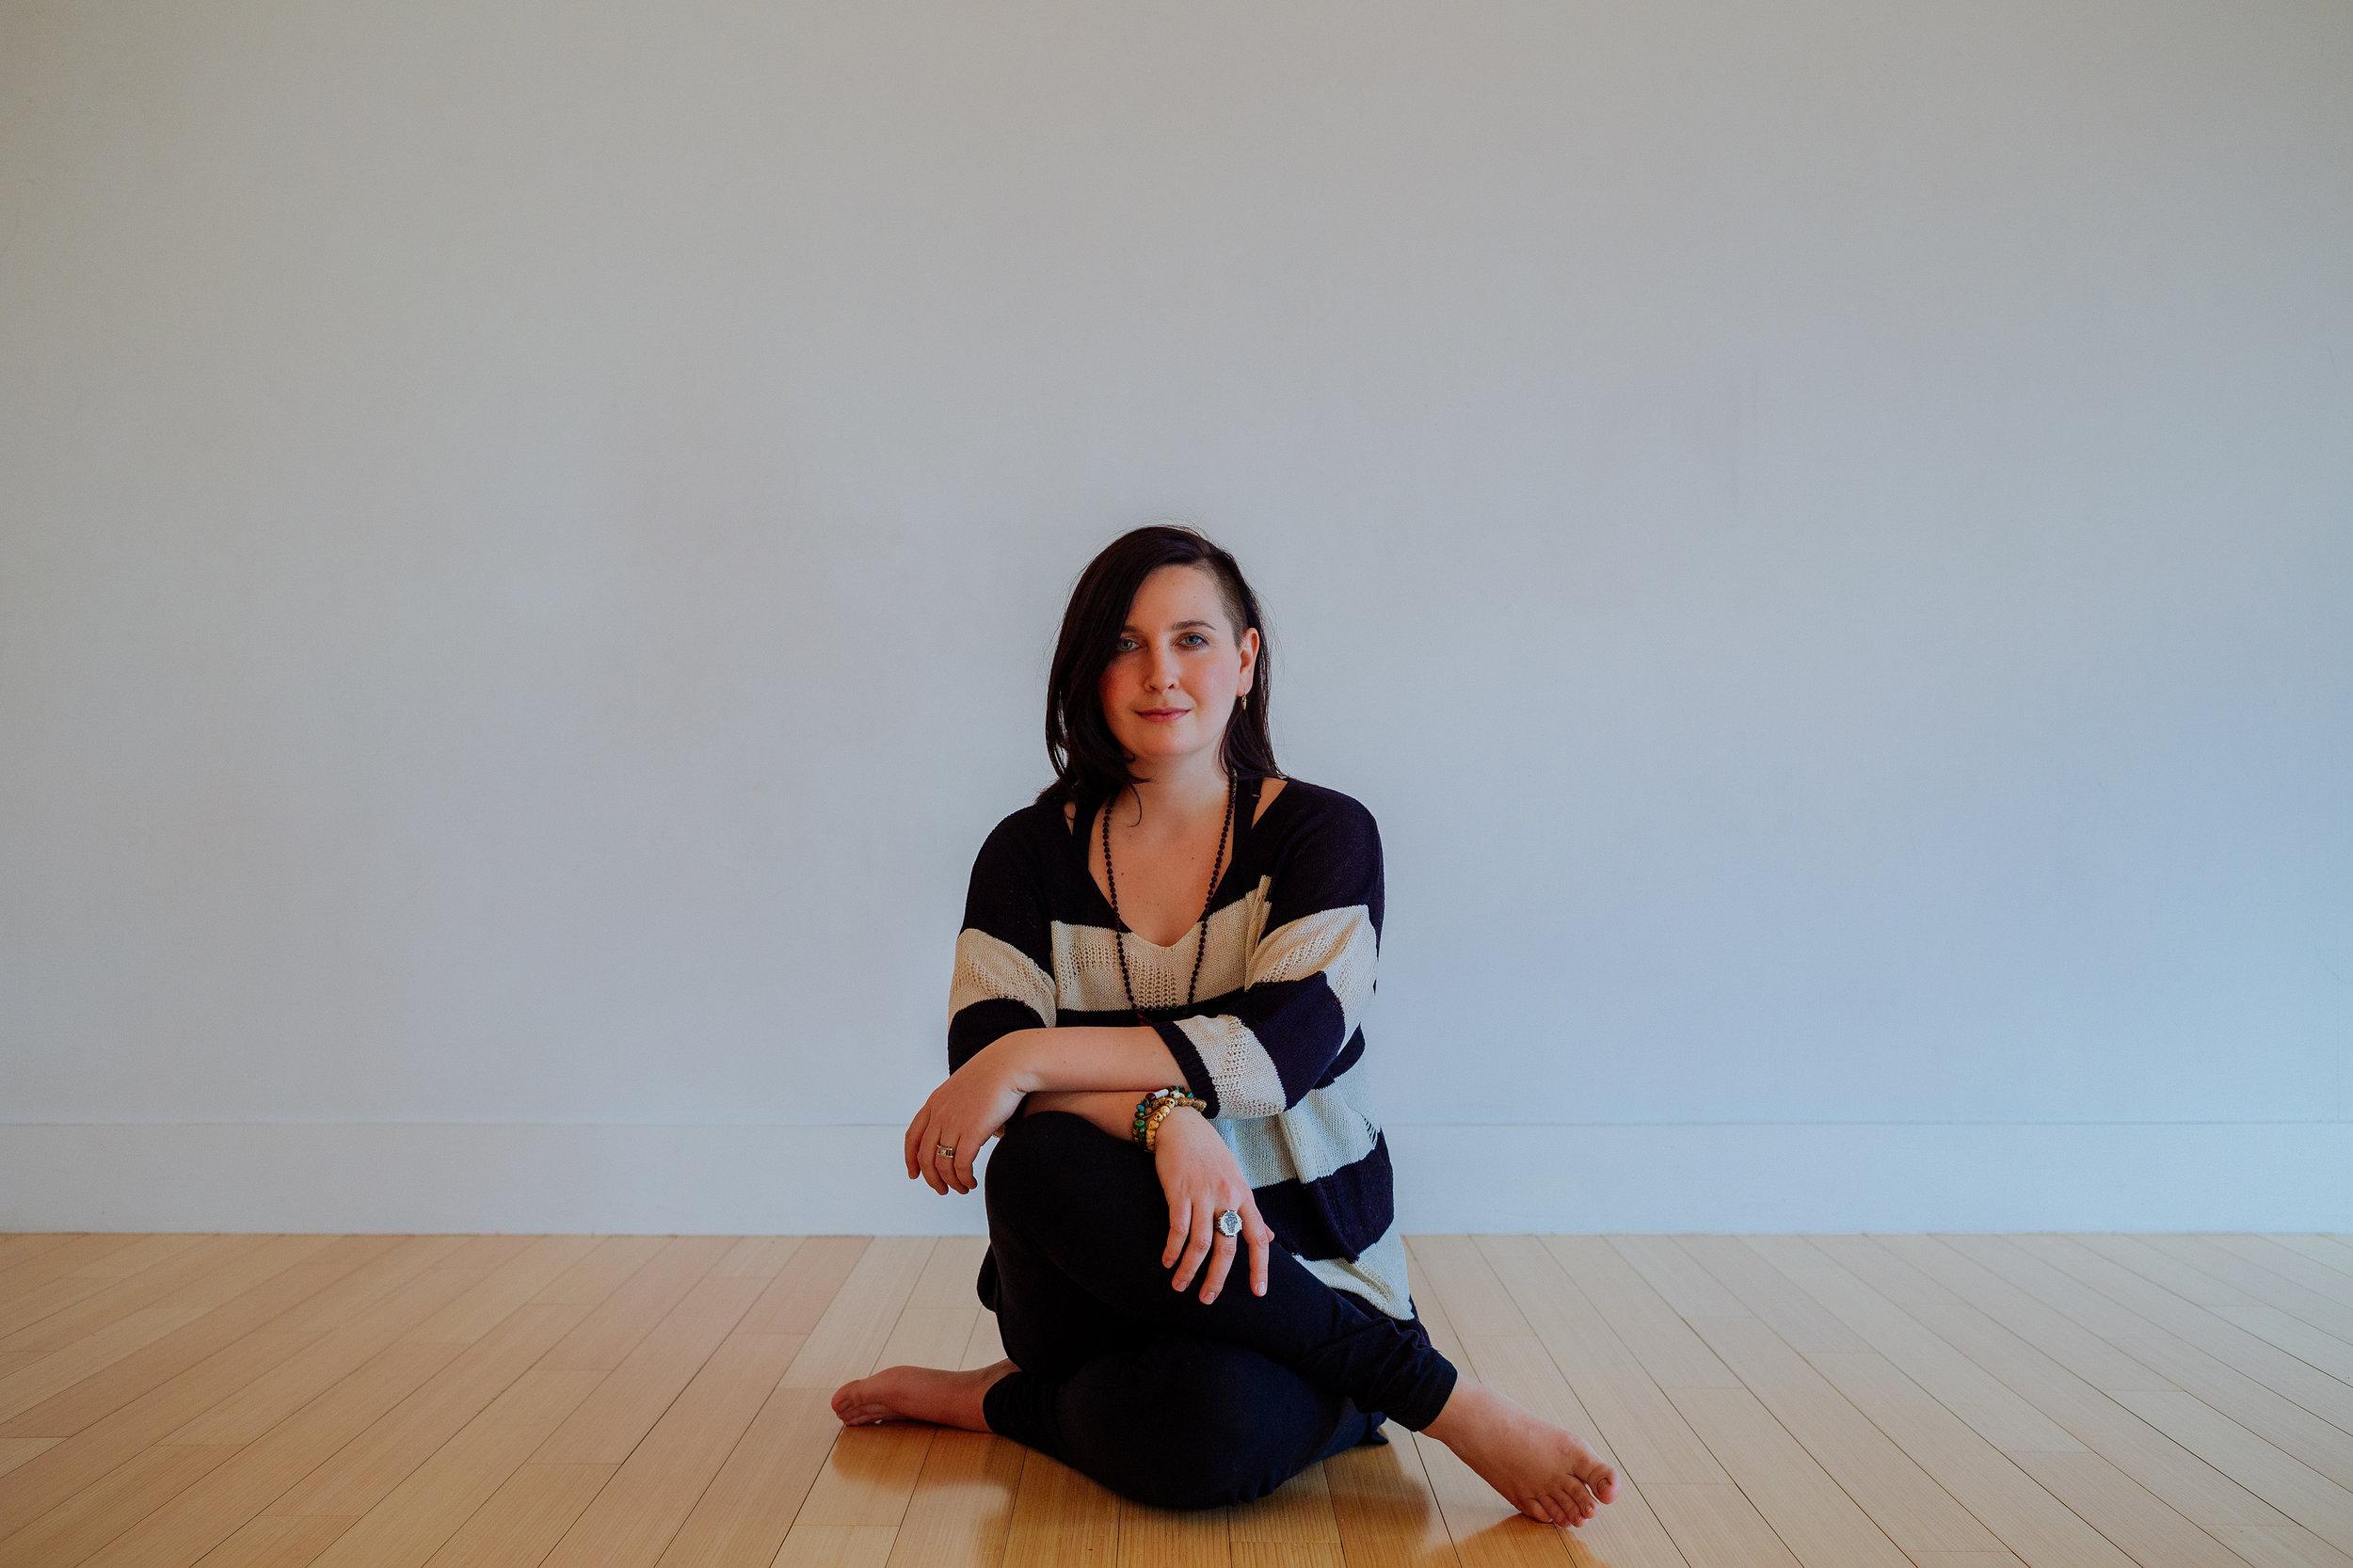 Monica.Justesen.Photography.03.16.Boston.Yoga.83.jpg